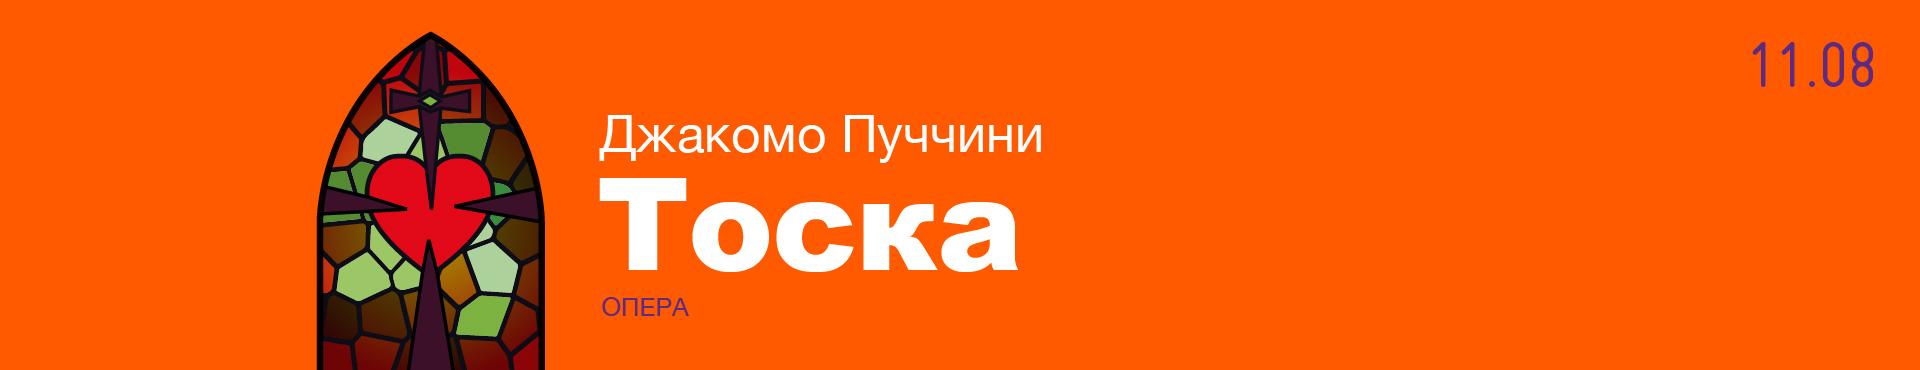 Birgitta Festival 2017 Tosca rus